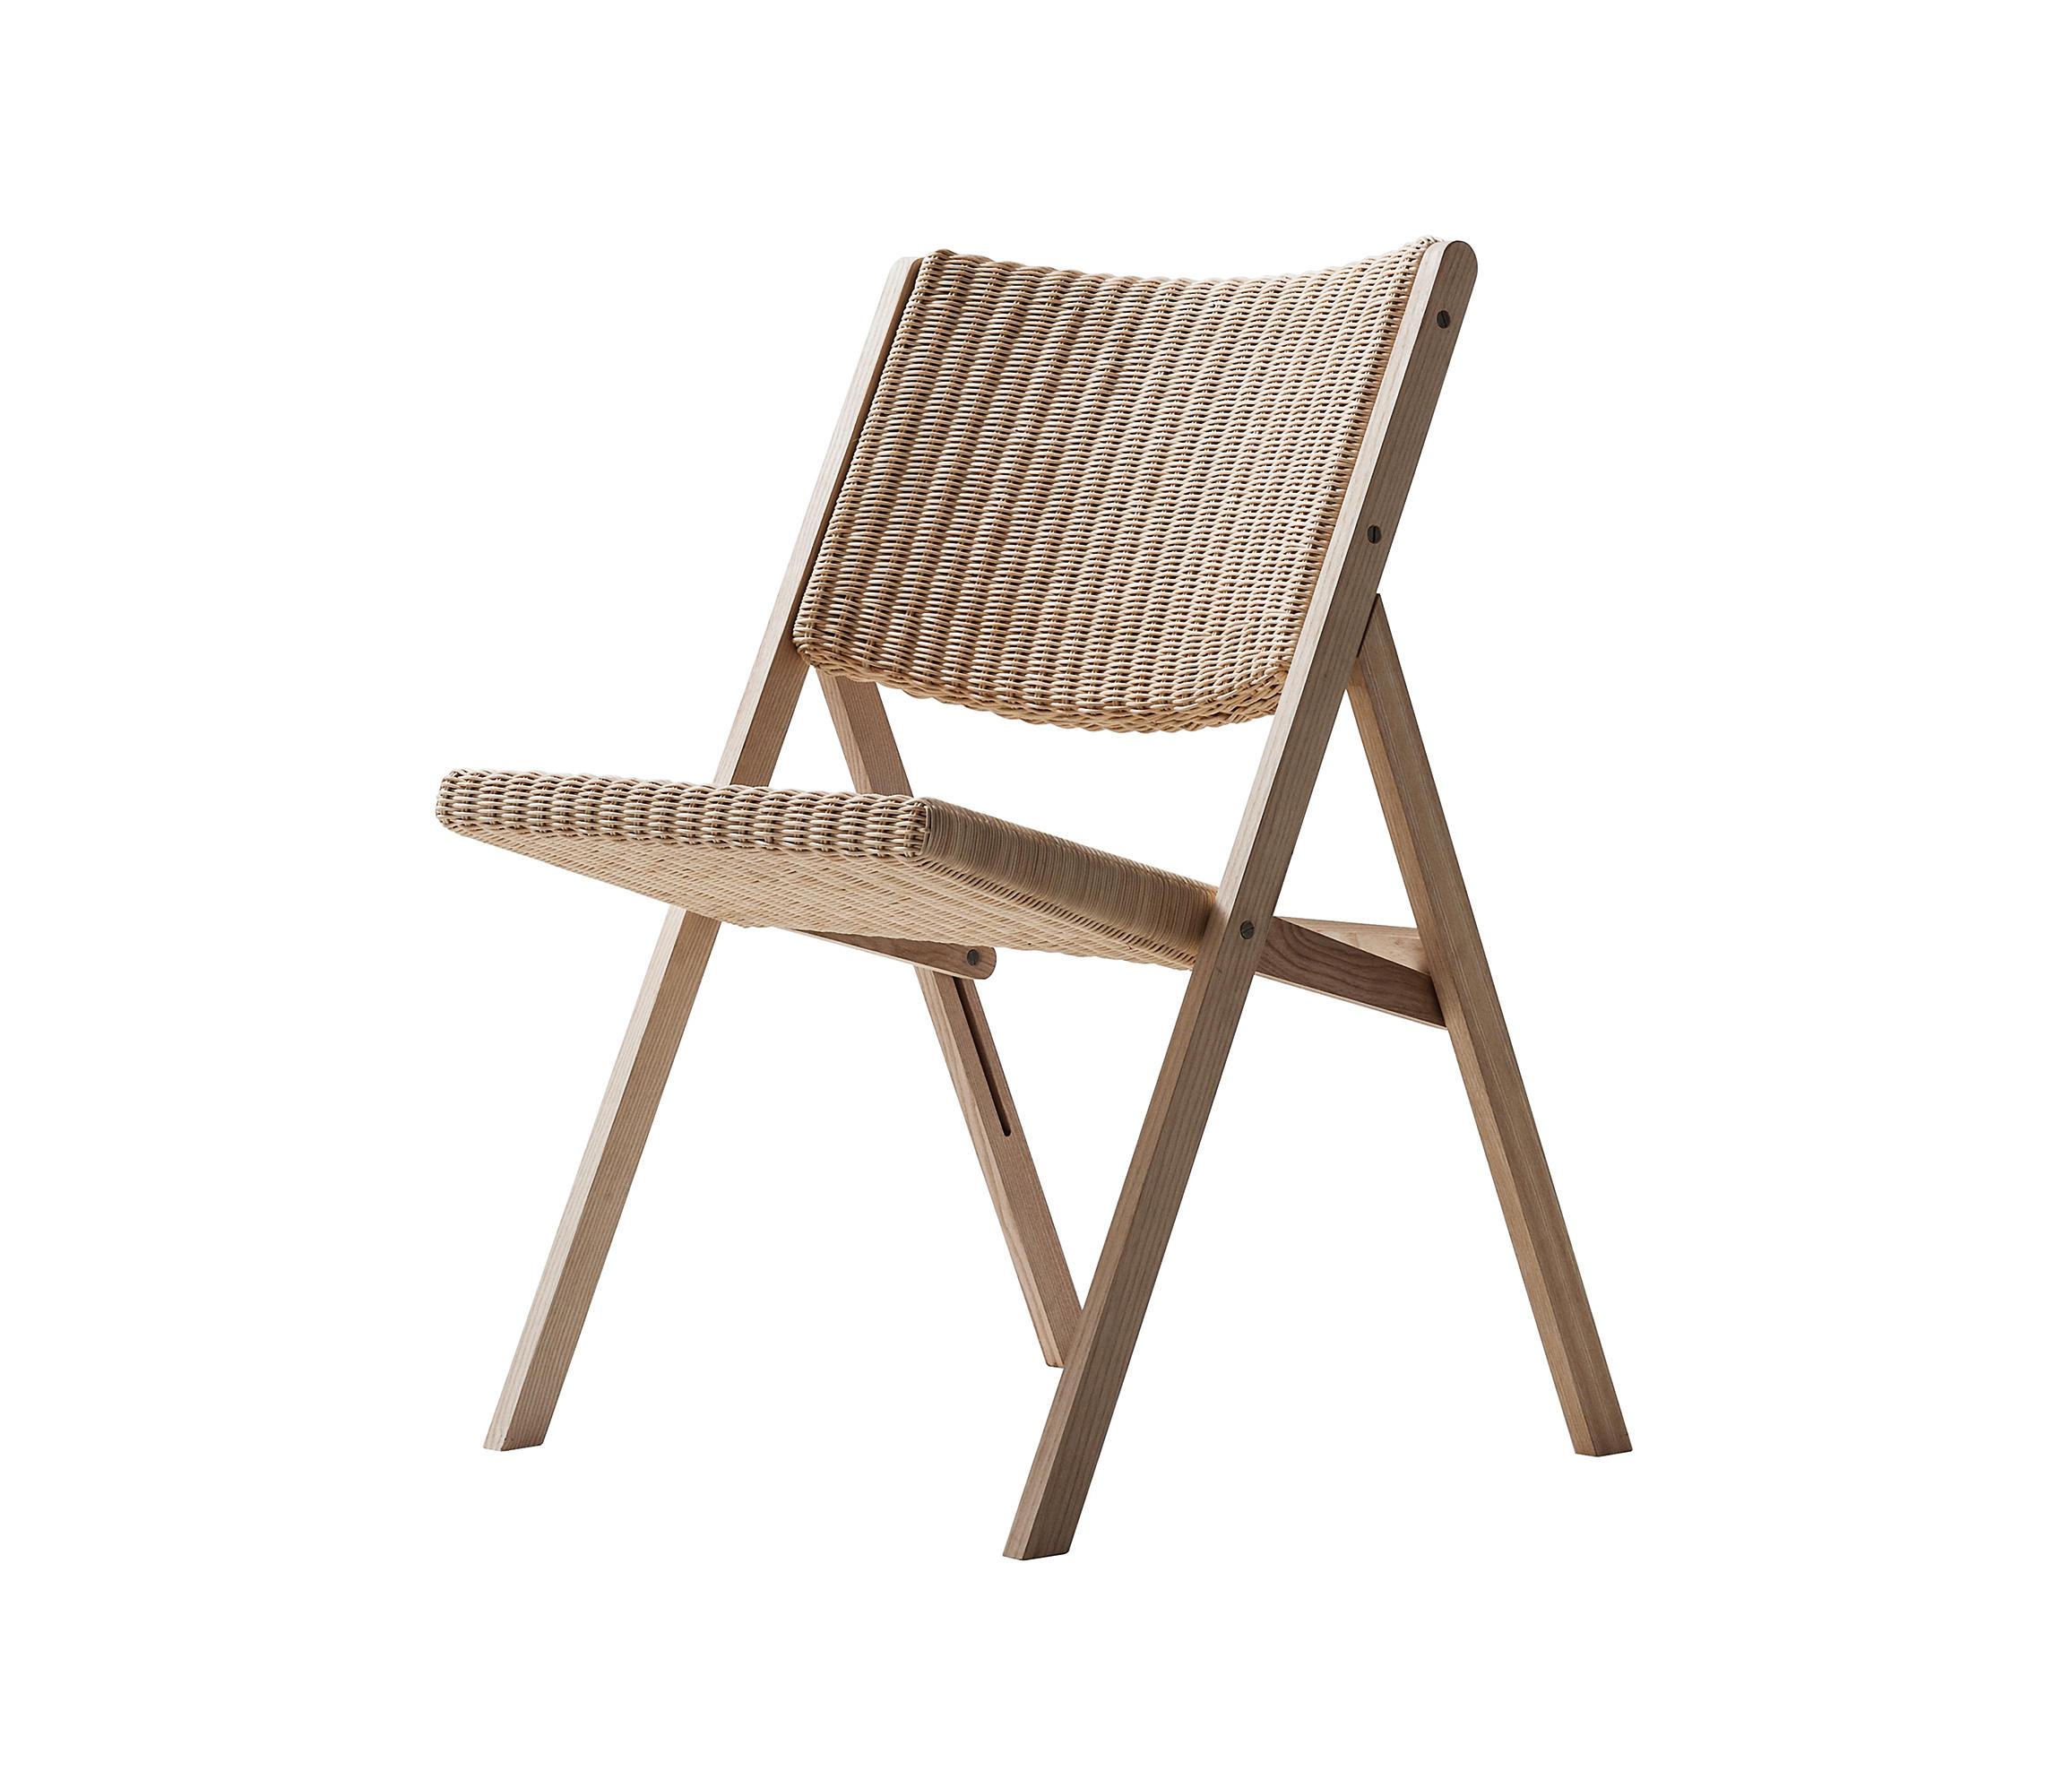 Molteniamp; Chaises De CArchitonic Chaise 1 270 D clJF1TK